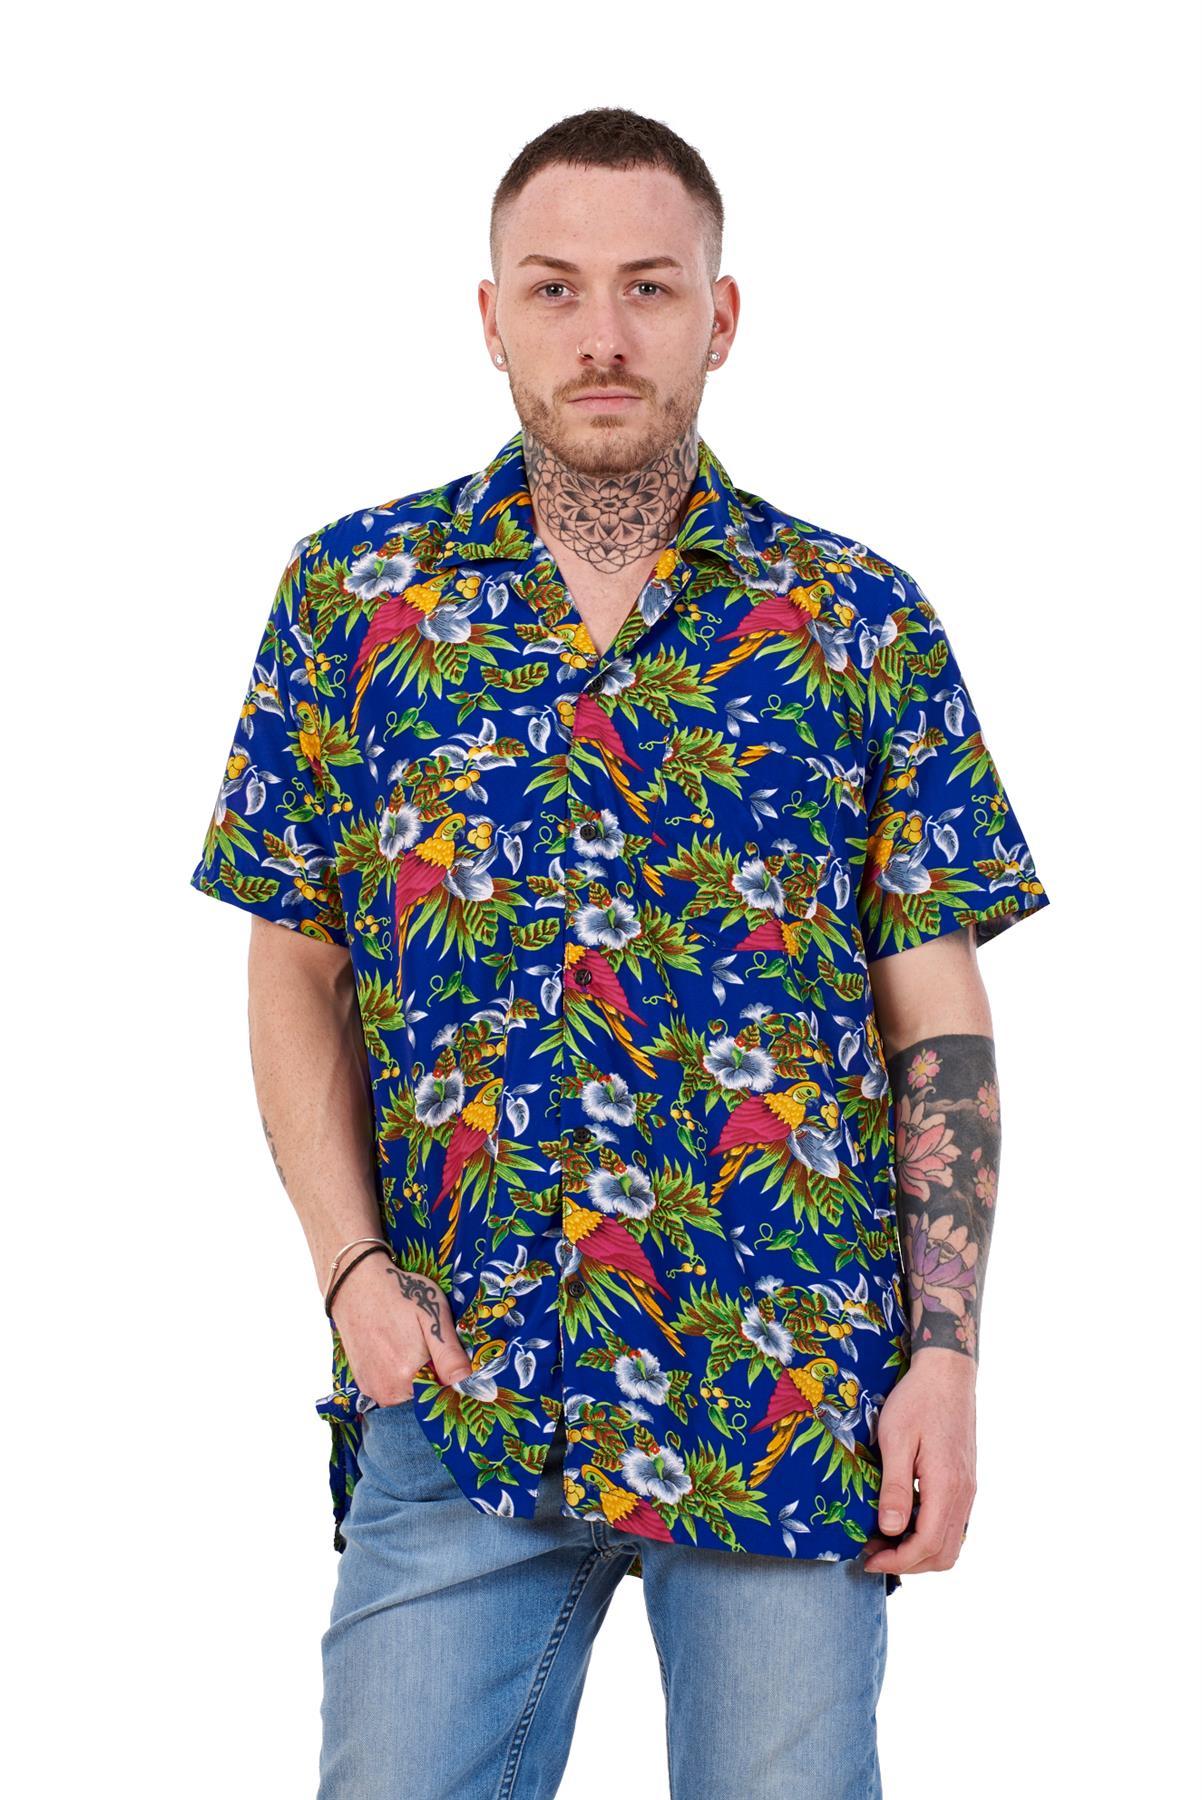 Mens-Hawaiian-Shirt-Multi-Colors-Print-Regular-Big-Size-Summer-Fancy-Dress-M-5XL thumbnail 17